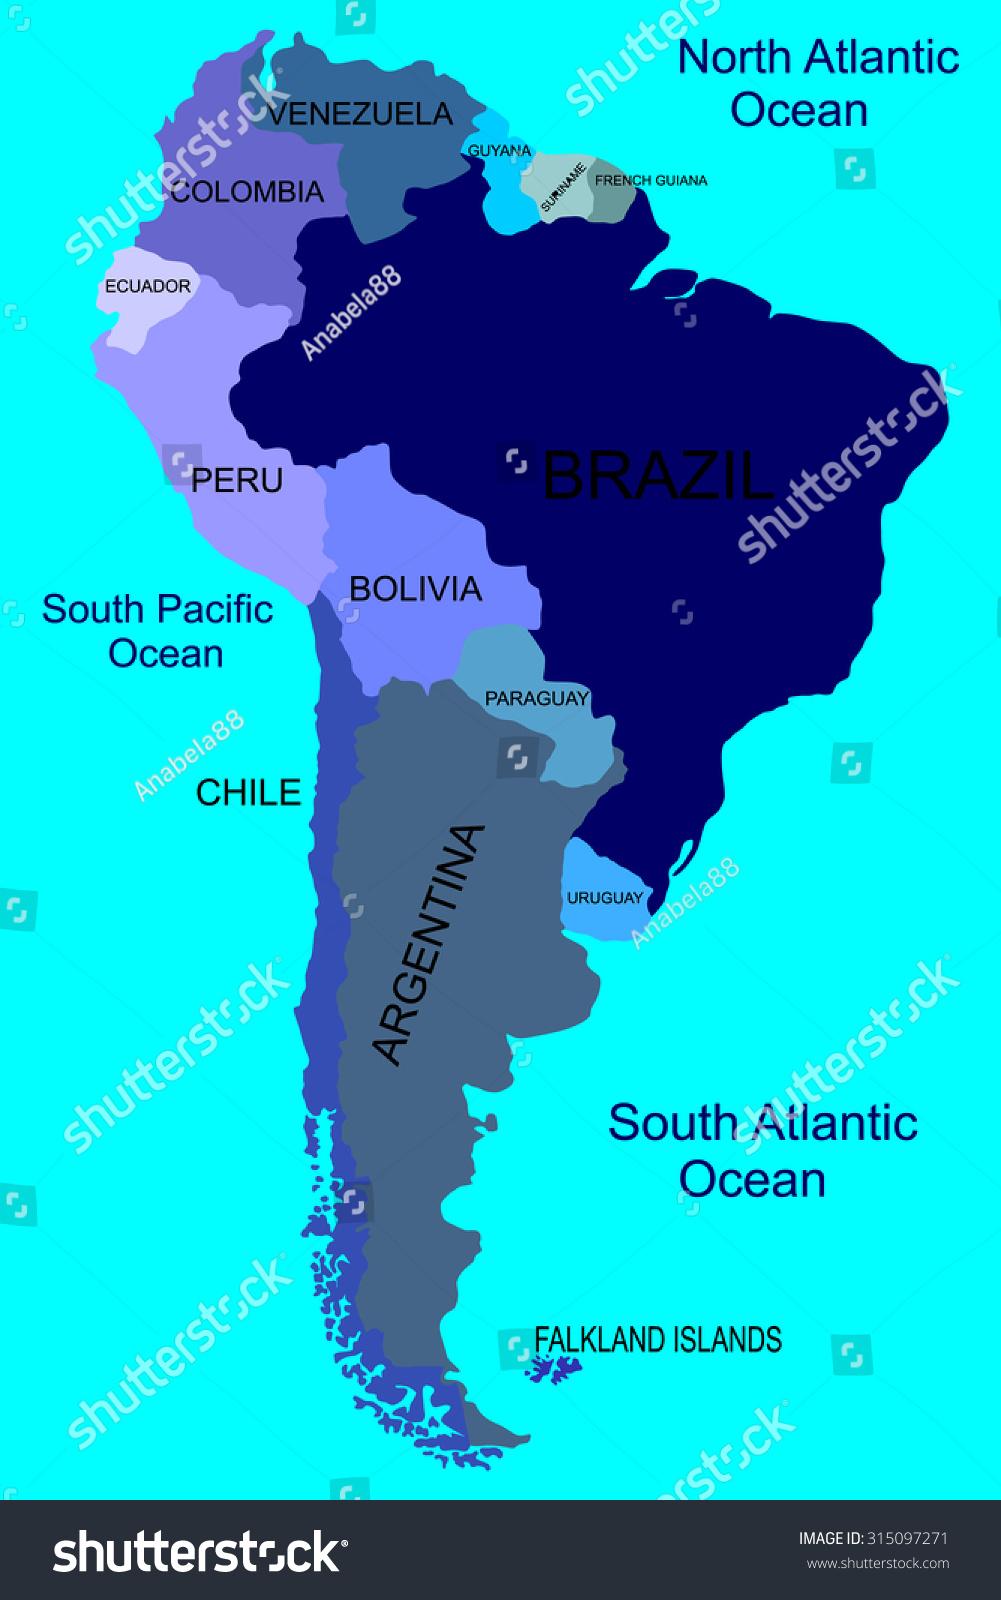 Map Ecuador South America Grease Traps Commercial Diagram First - Ecuador map south america